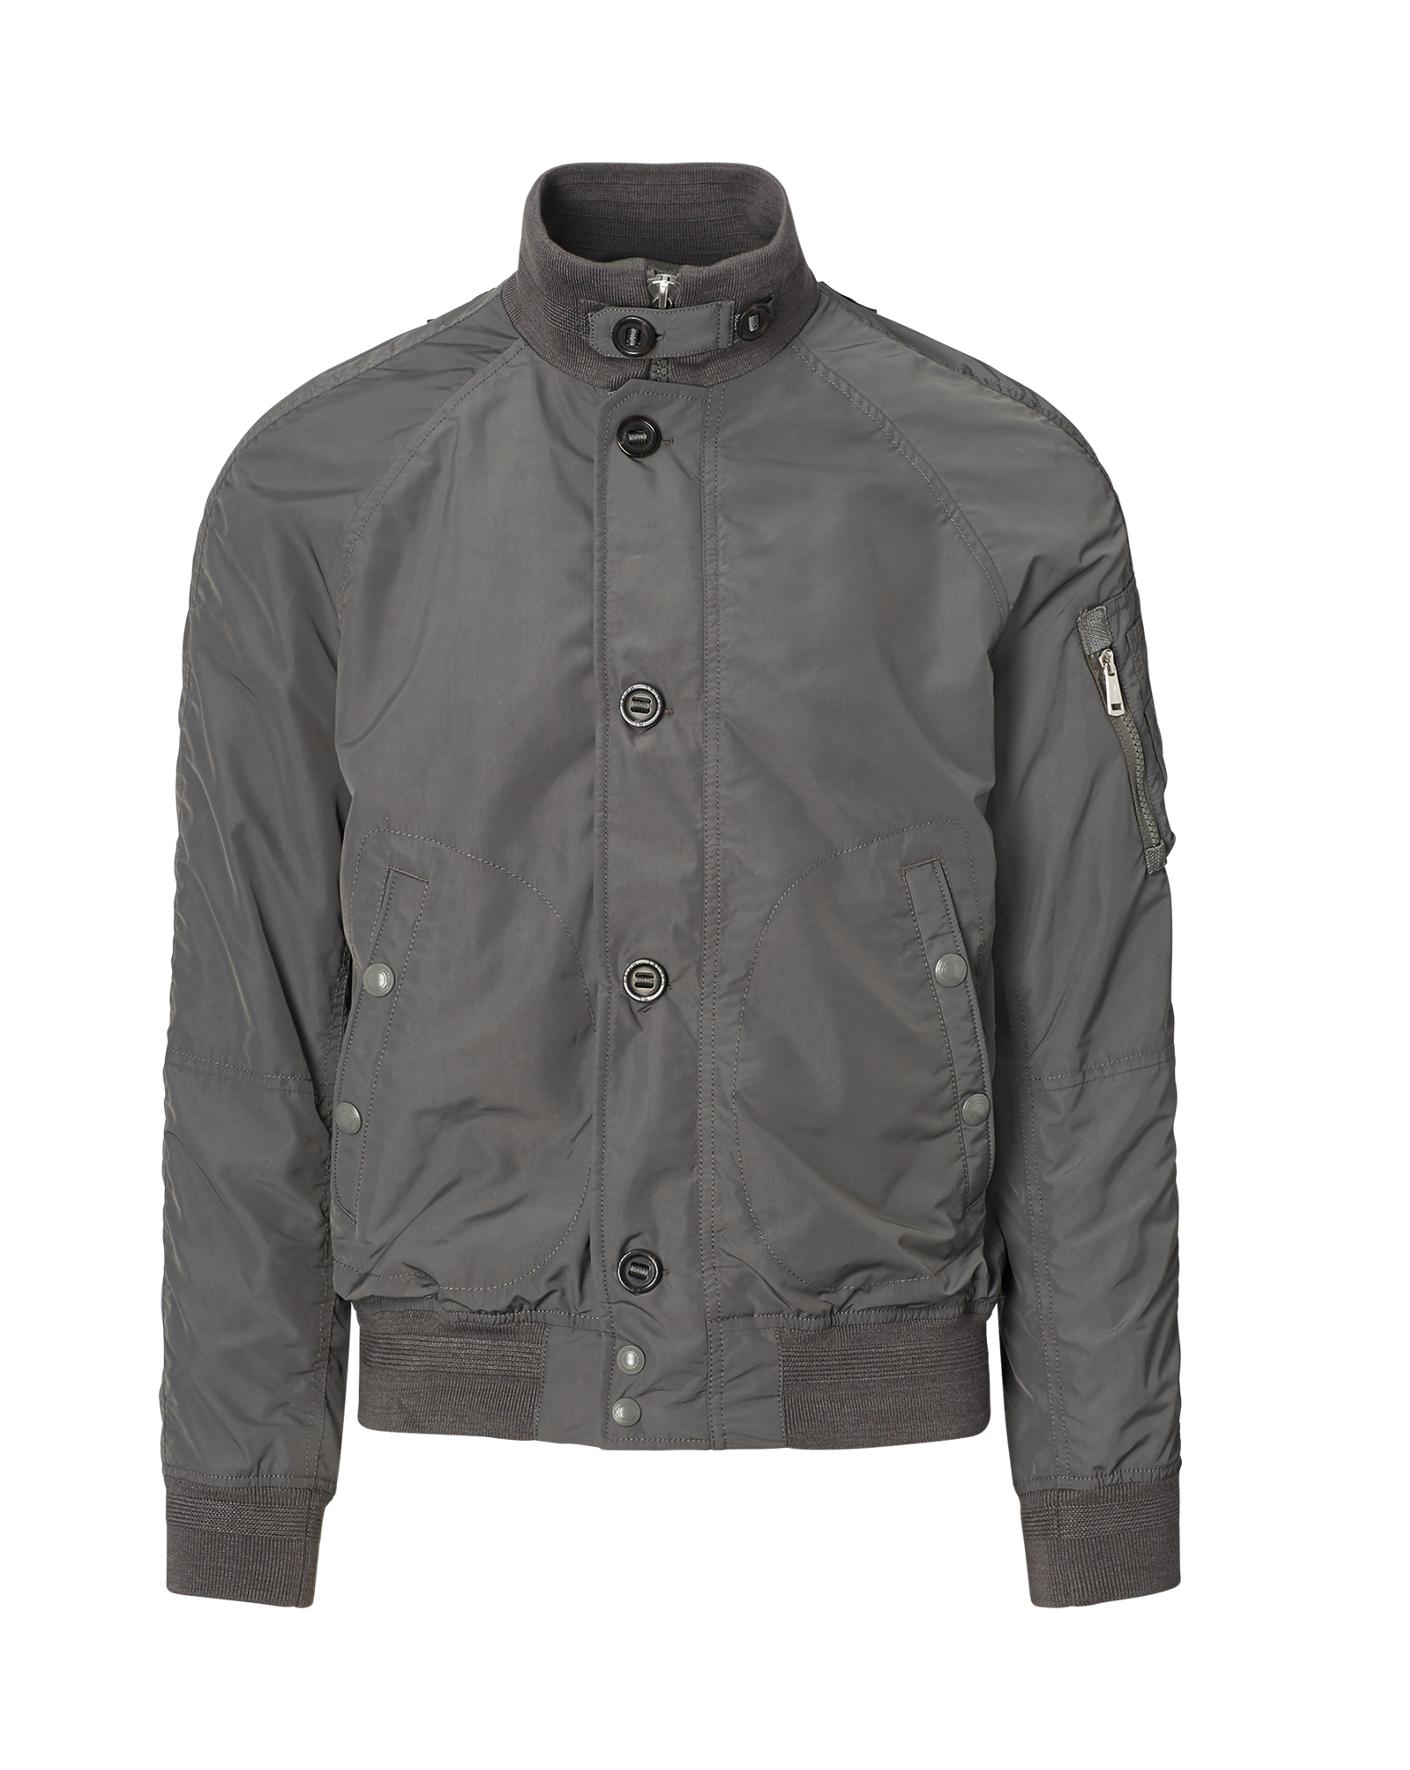 Men's Polo Jackets, Coats & Windbreakers | Polo Ralph Lauren